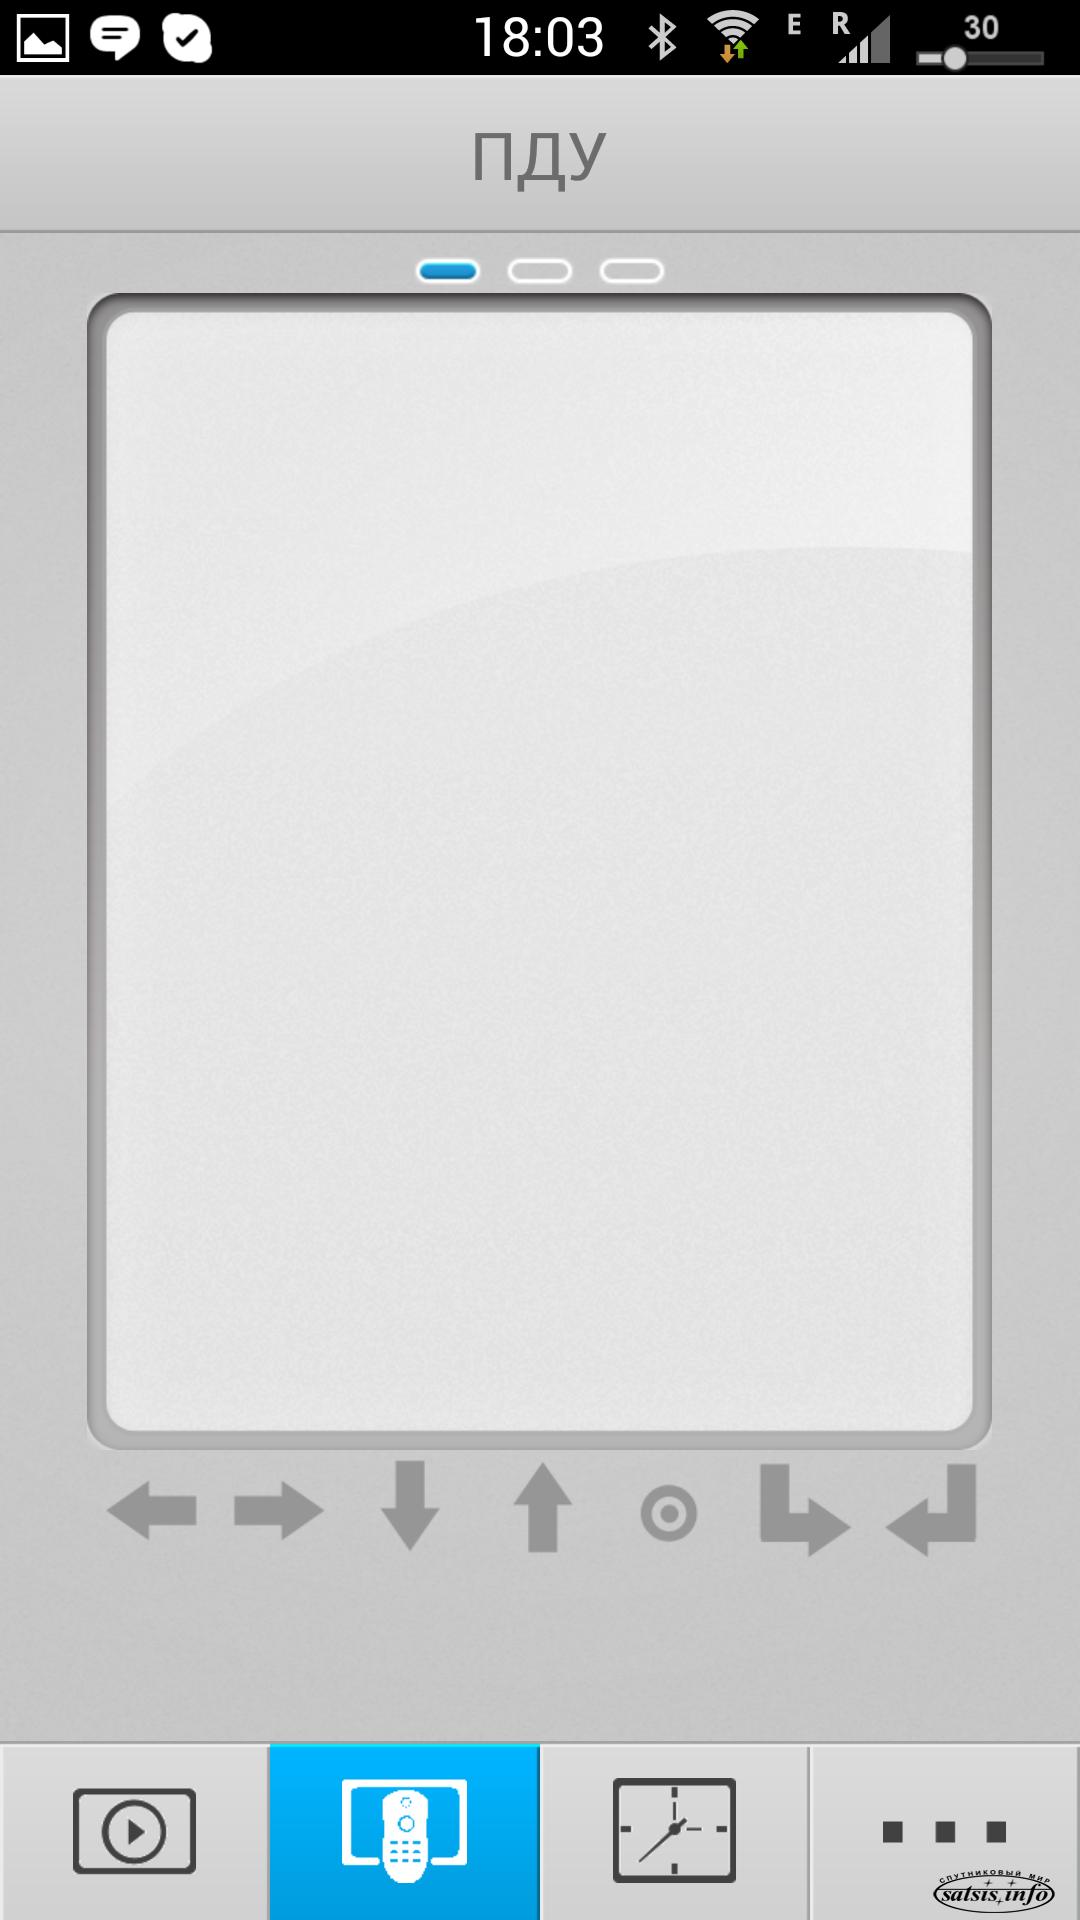 https://satsis.info/uploads/forum/posts/2014-06/1401808322_www.satsis.info_g_mscreen_6.png